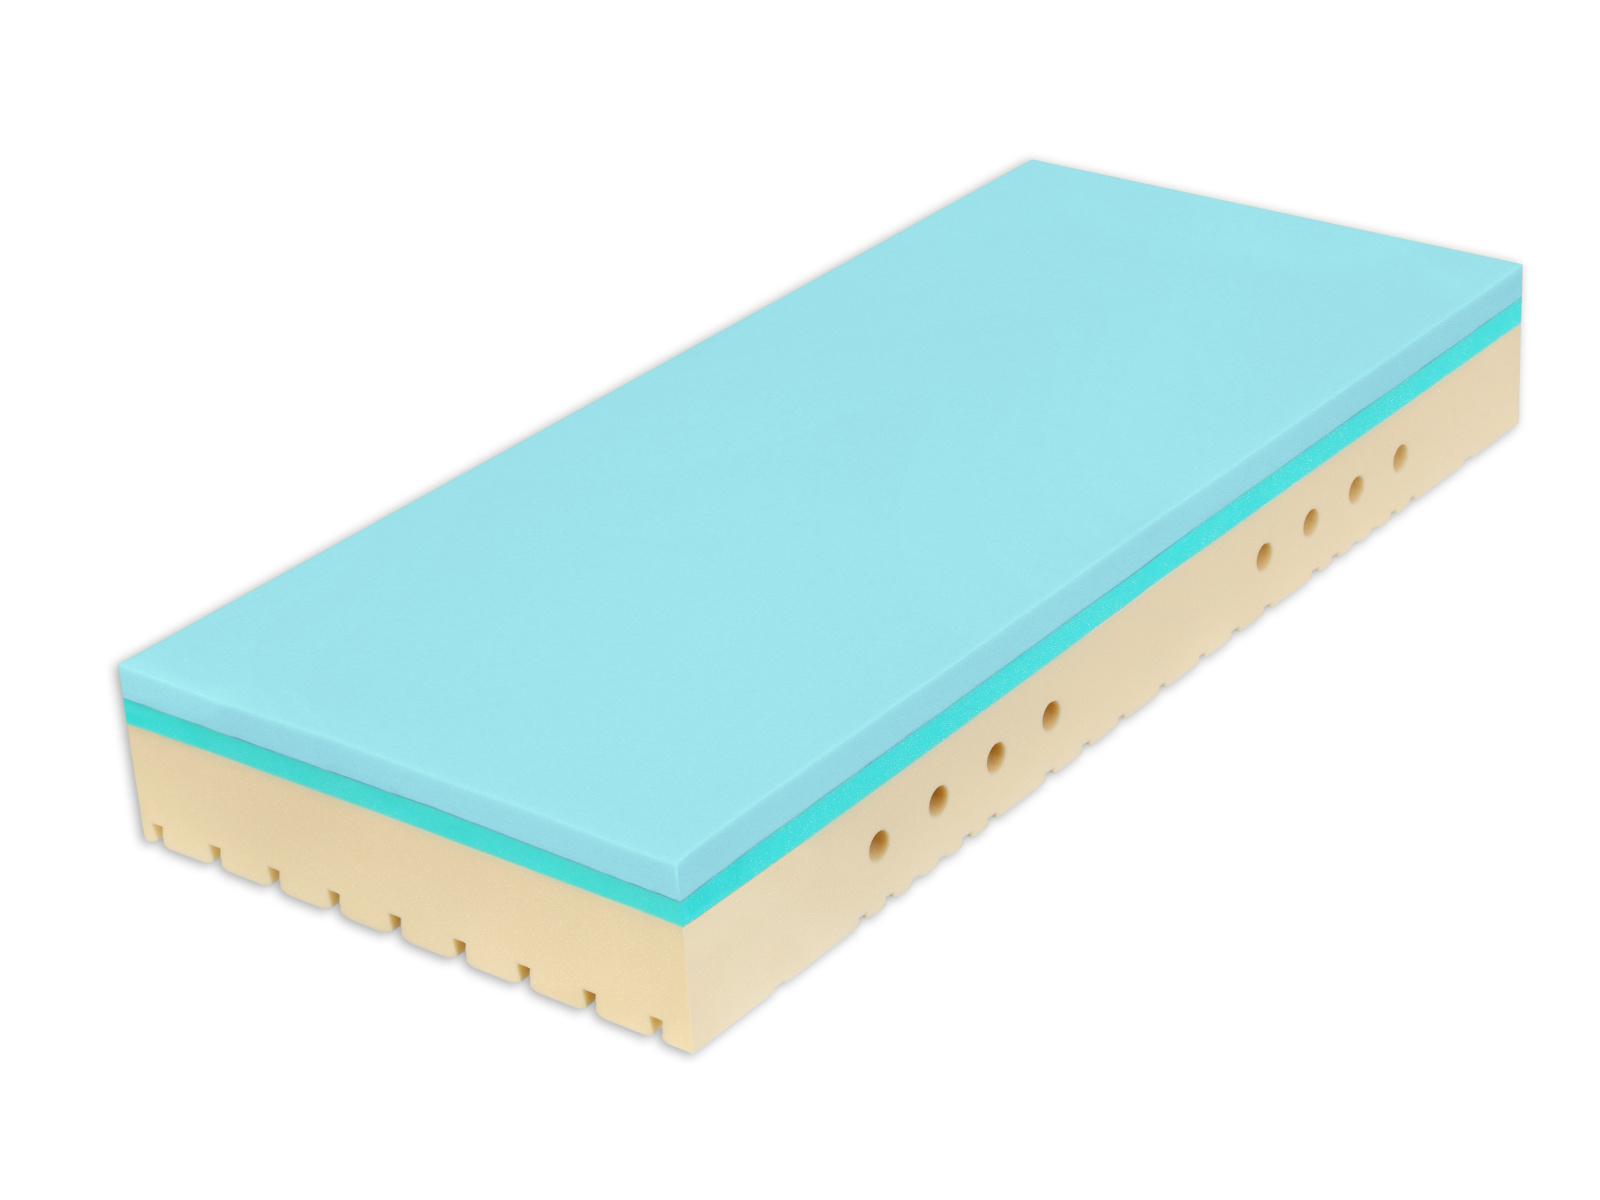 Matrace SUPER FOX BLUE Classic 90x200x20 cm, 1+1 ZDARMA